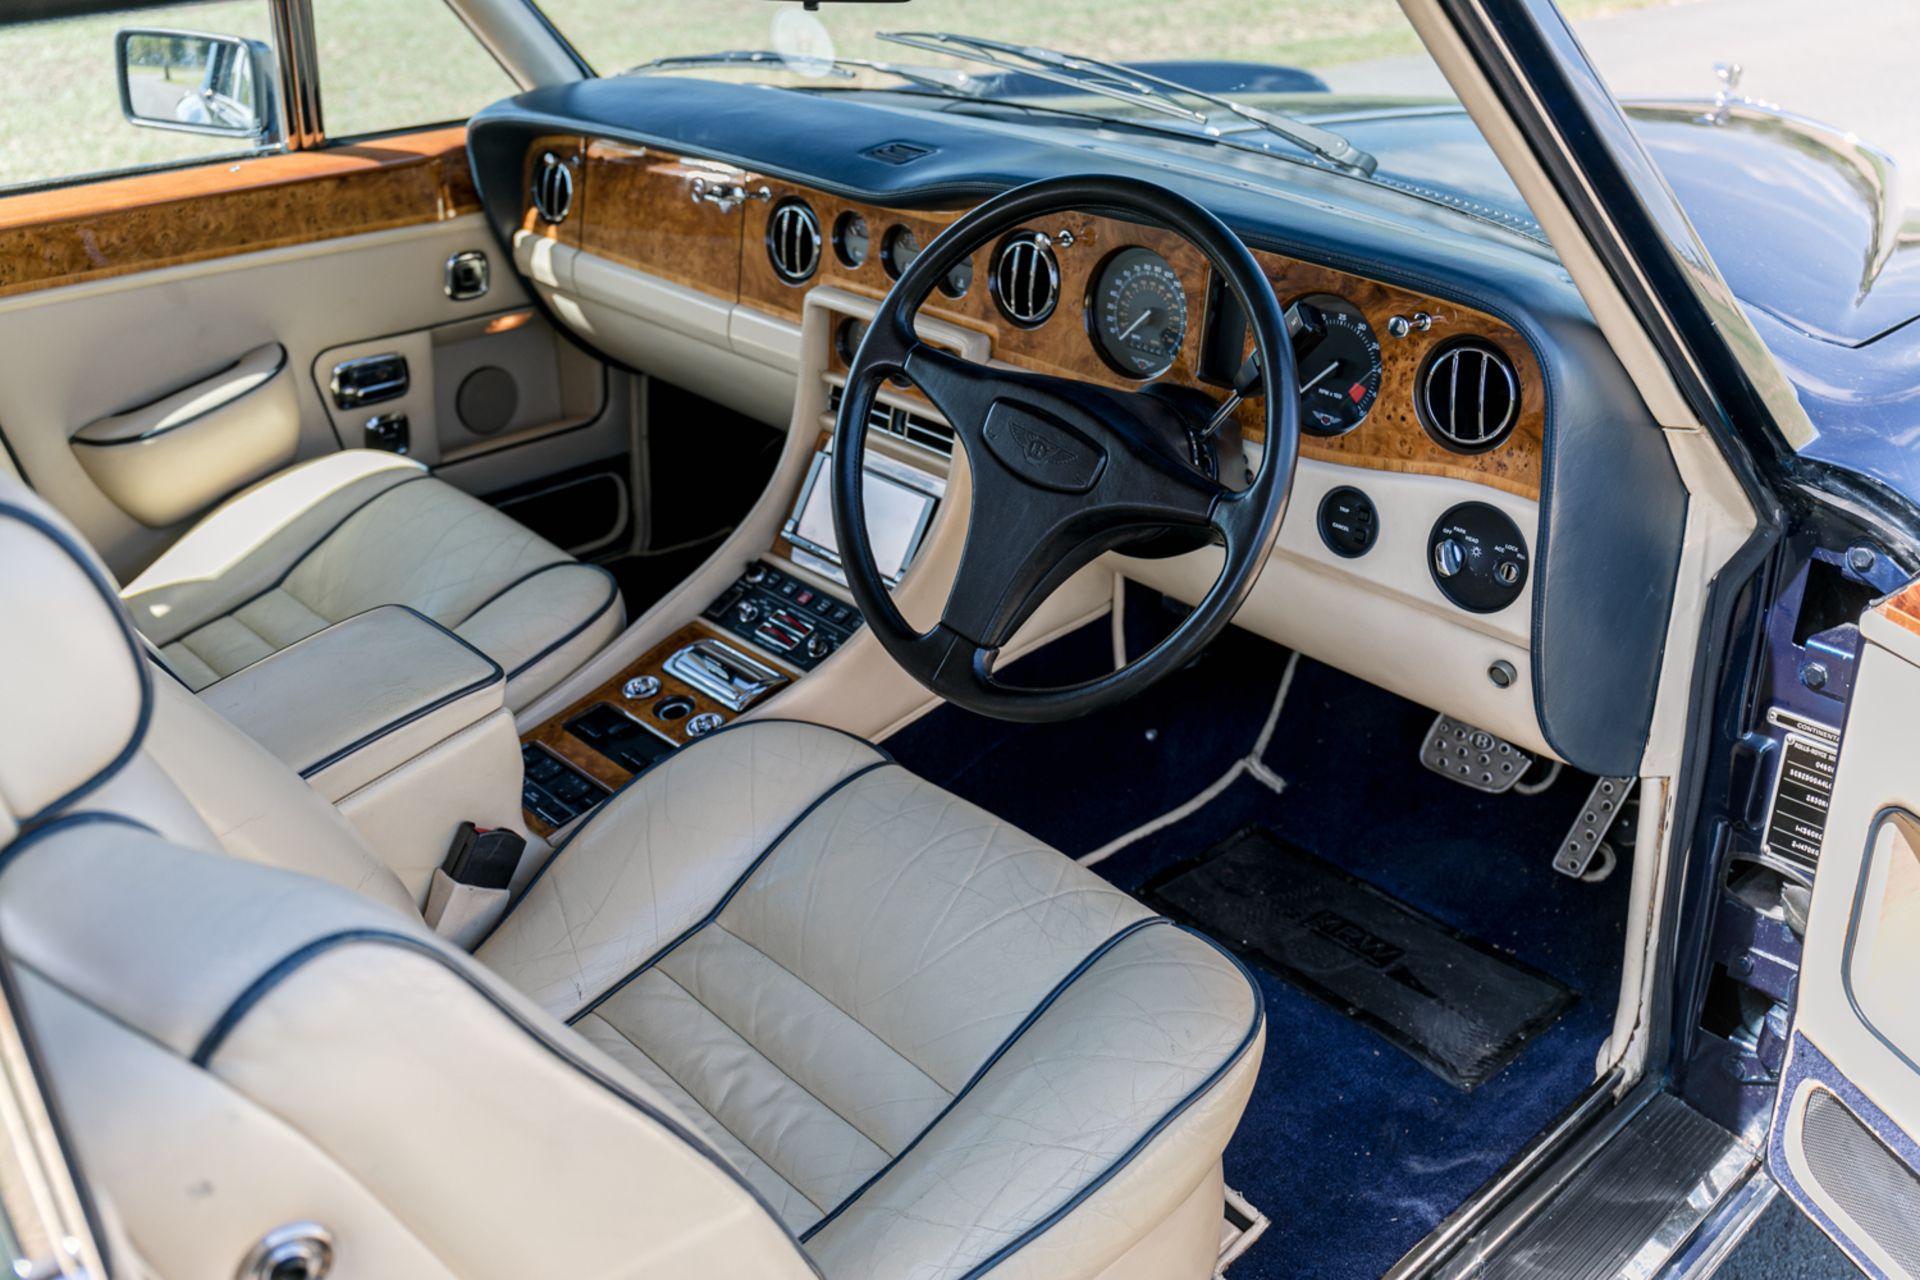 Lot 151 - 1991 Bentley Continental Convertible III